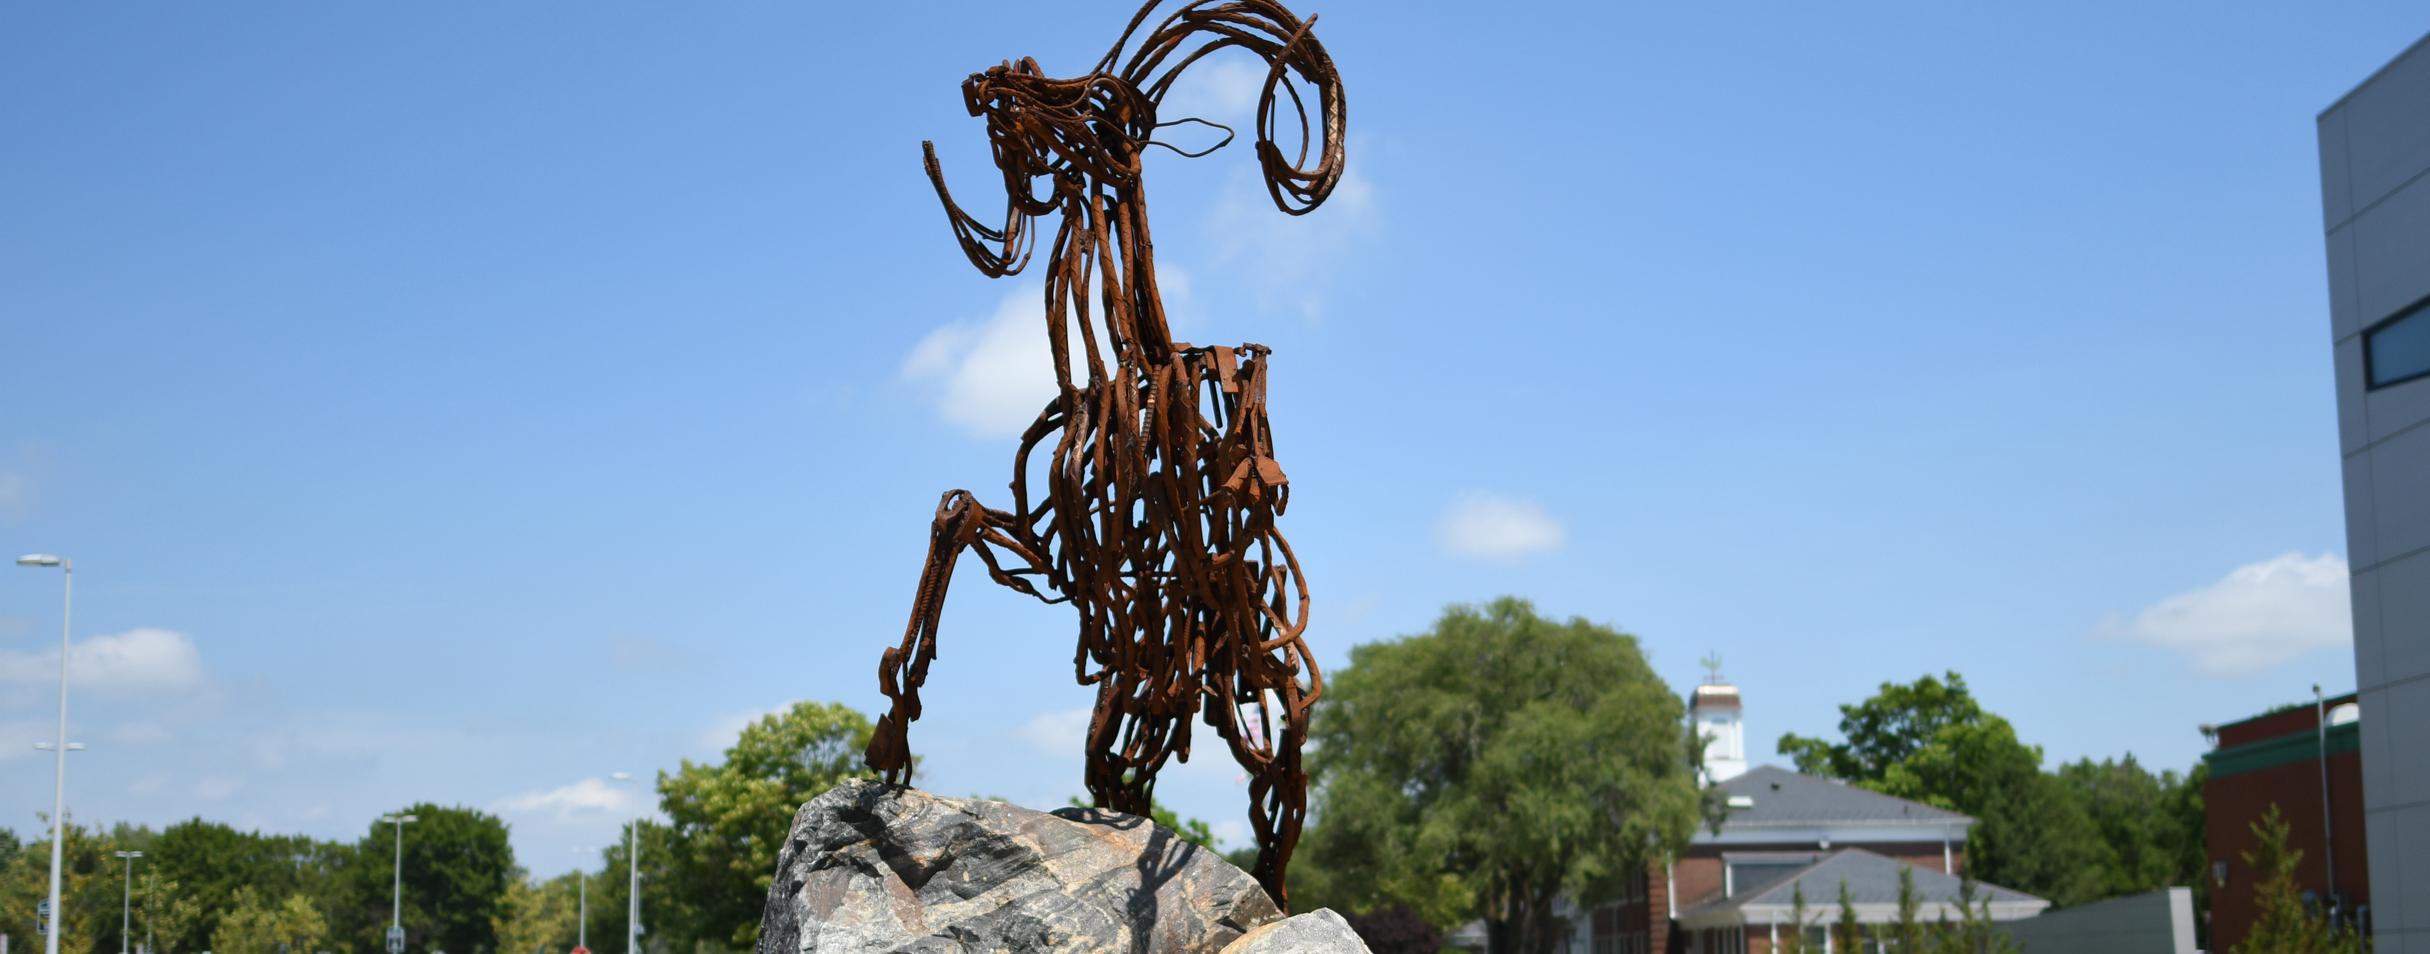 Image of metal sculpture of ram